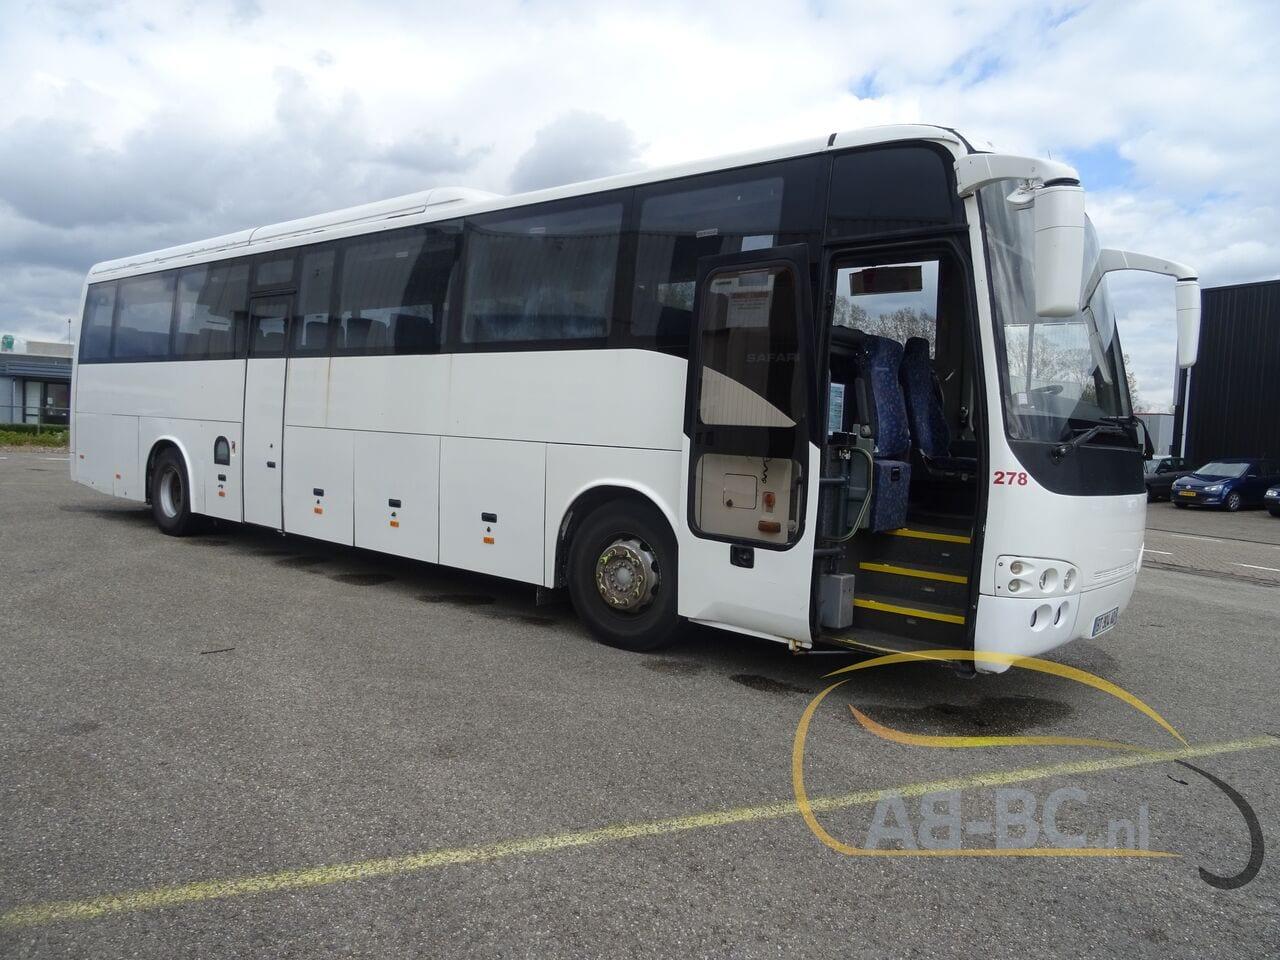 coach-busTEMSA-Safari-RD-65-Seats---1620311660386118556_big_40ef43dda813e3298e41ad274cadc7e5--21050617272795316700